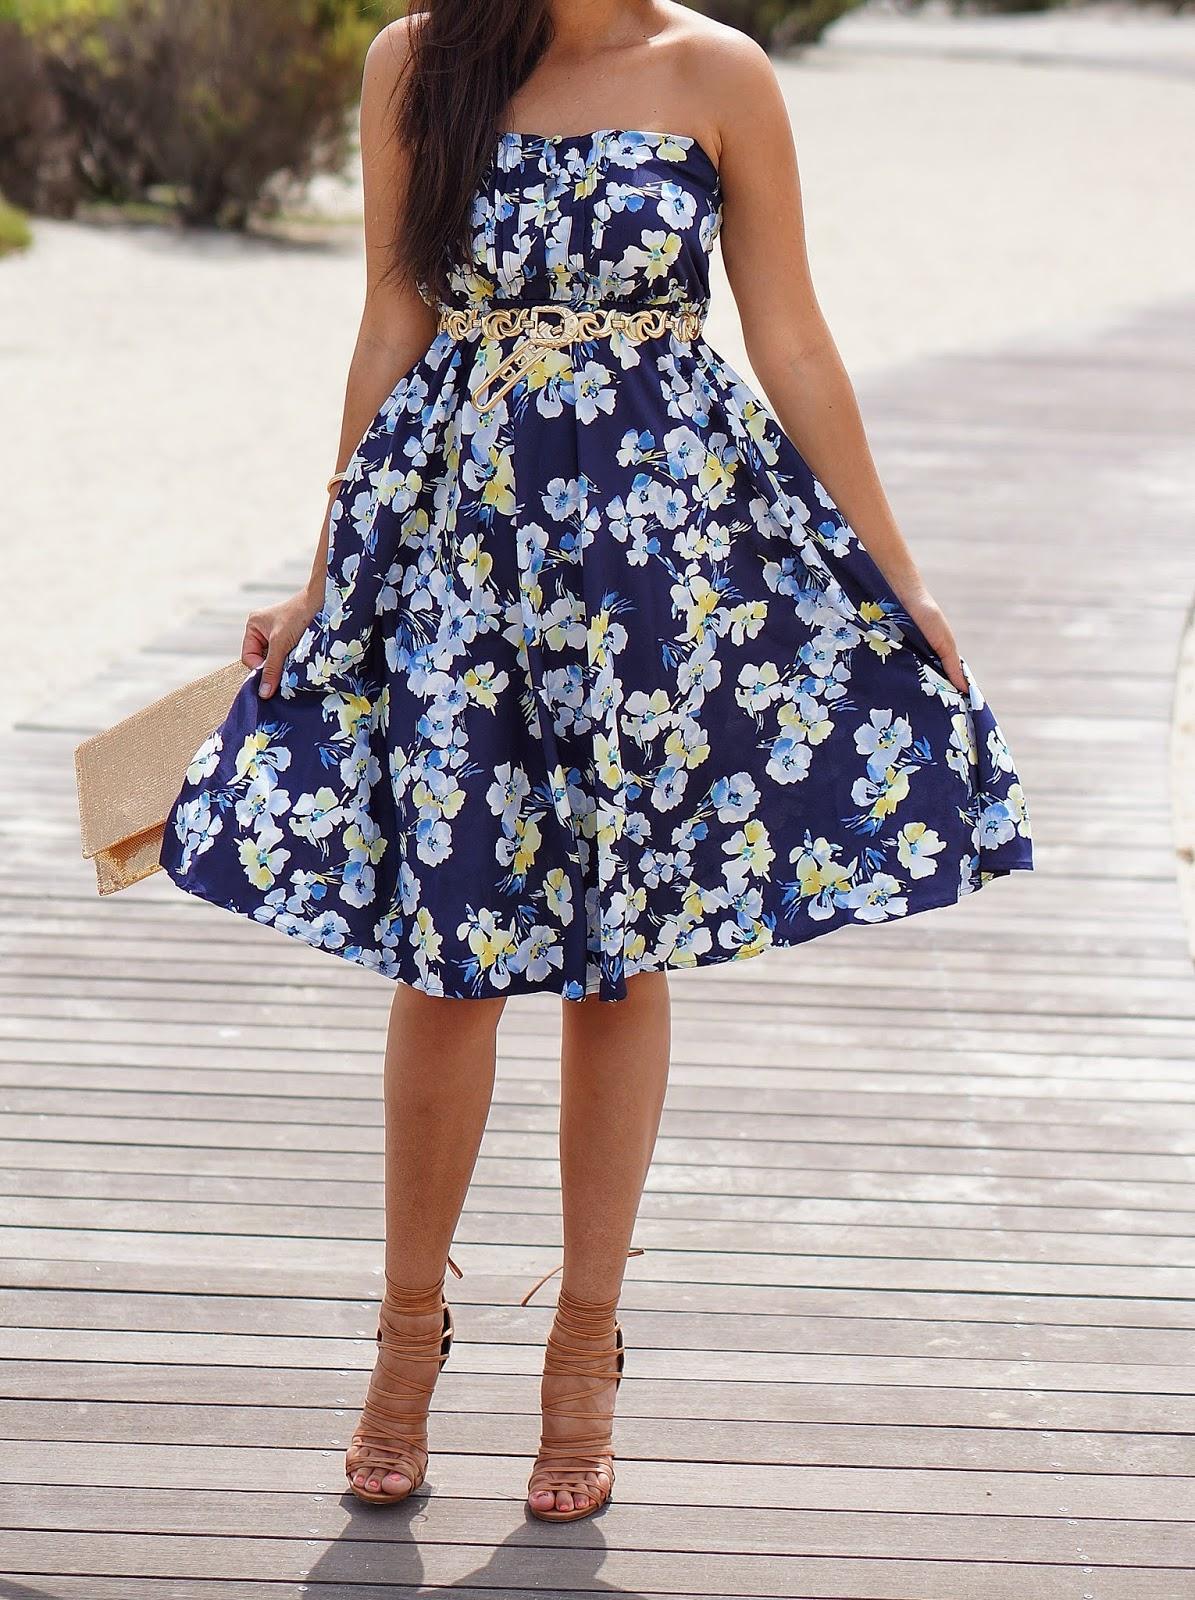 LC Lauren Conrad Floral Dress